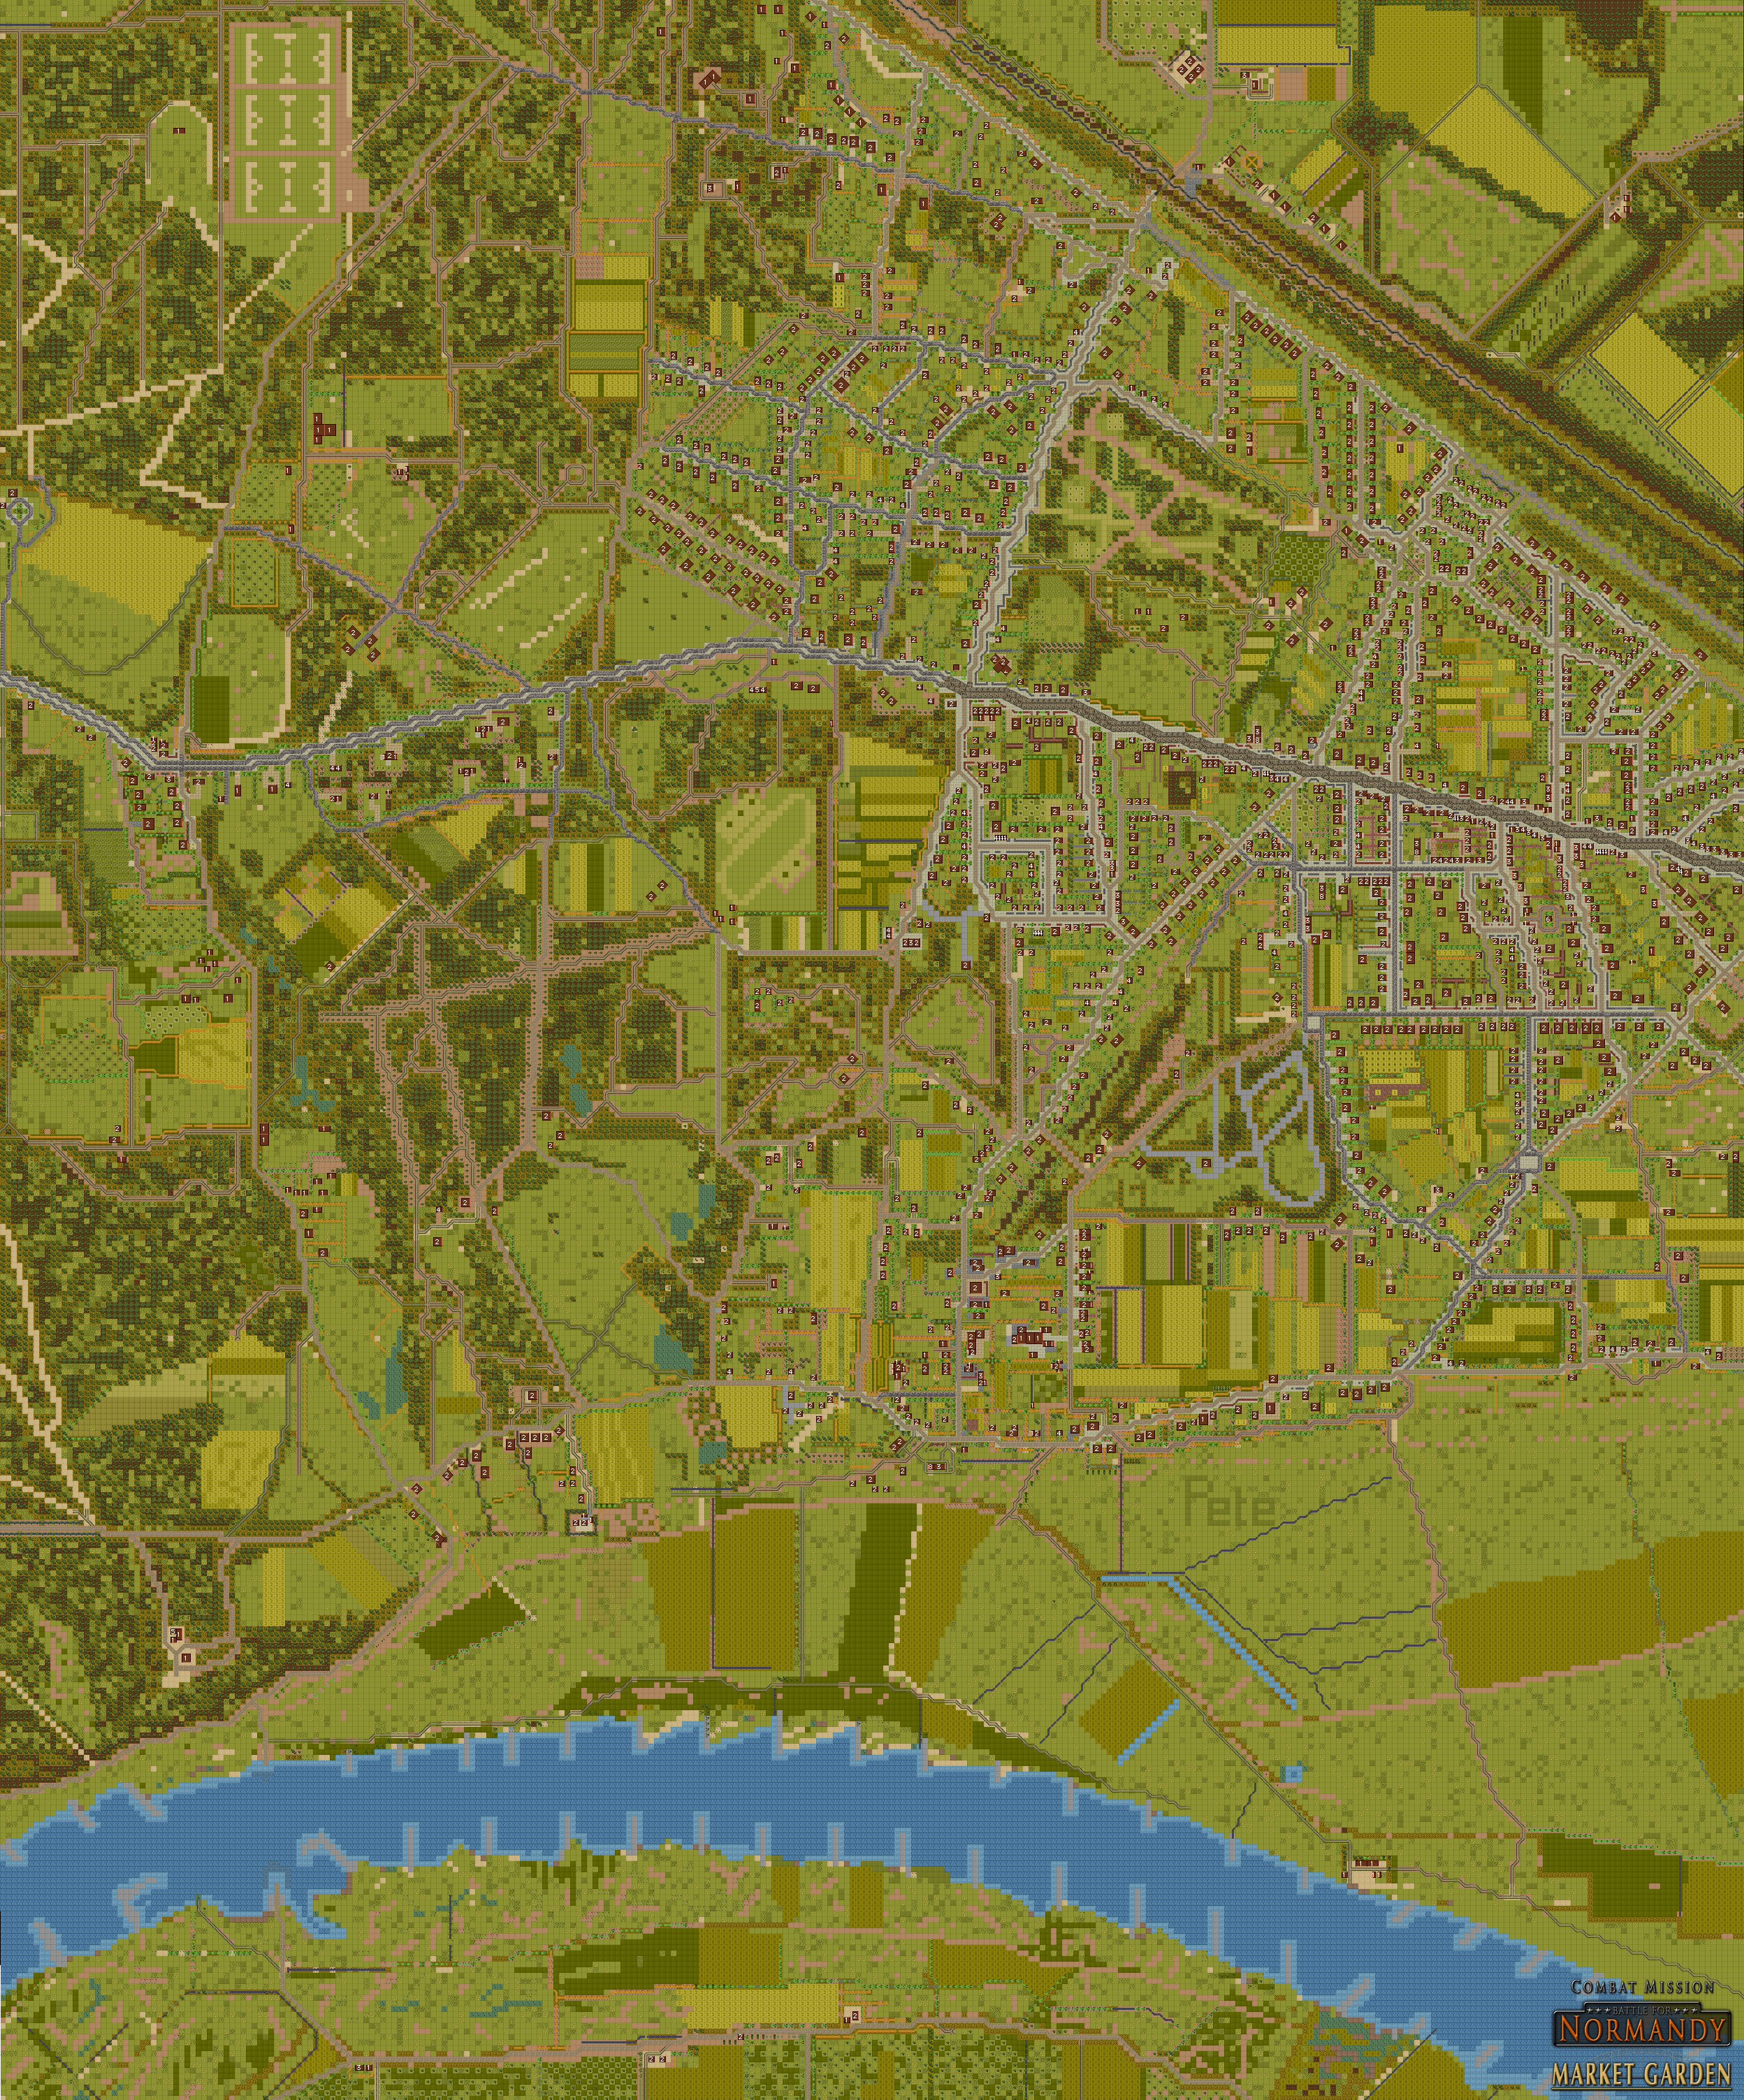 oosterbeek-CM-map